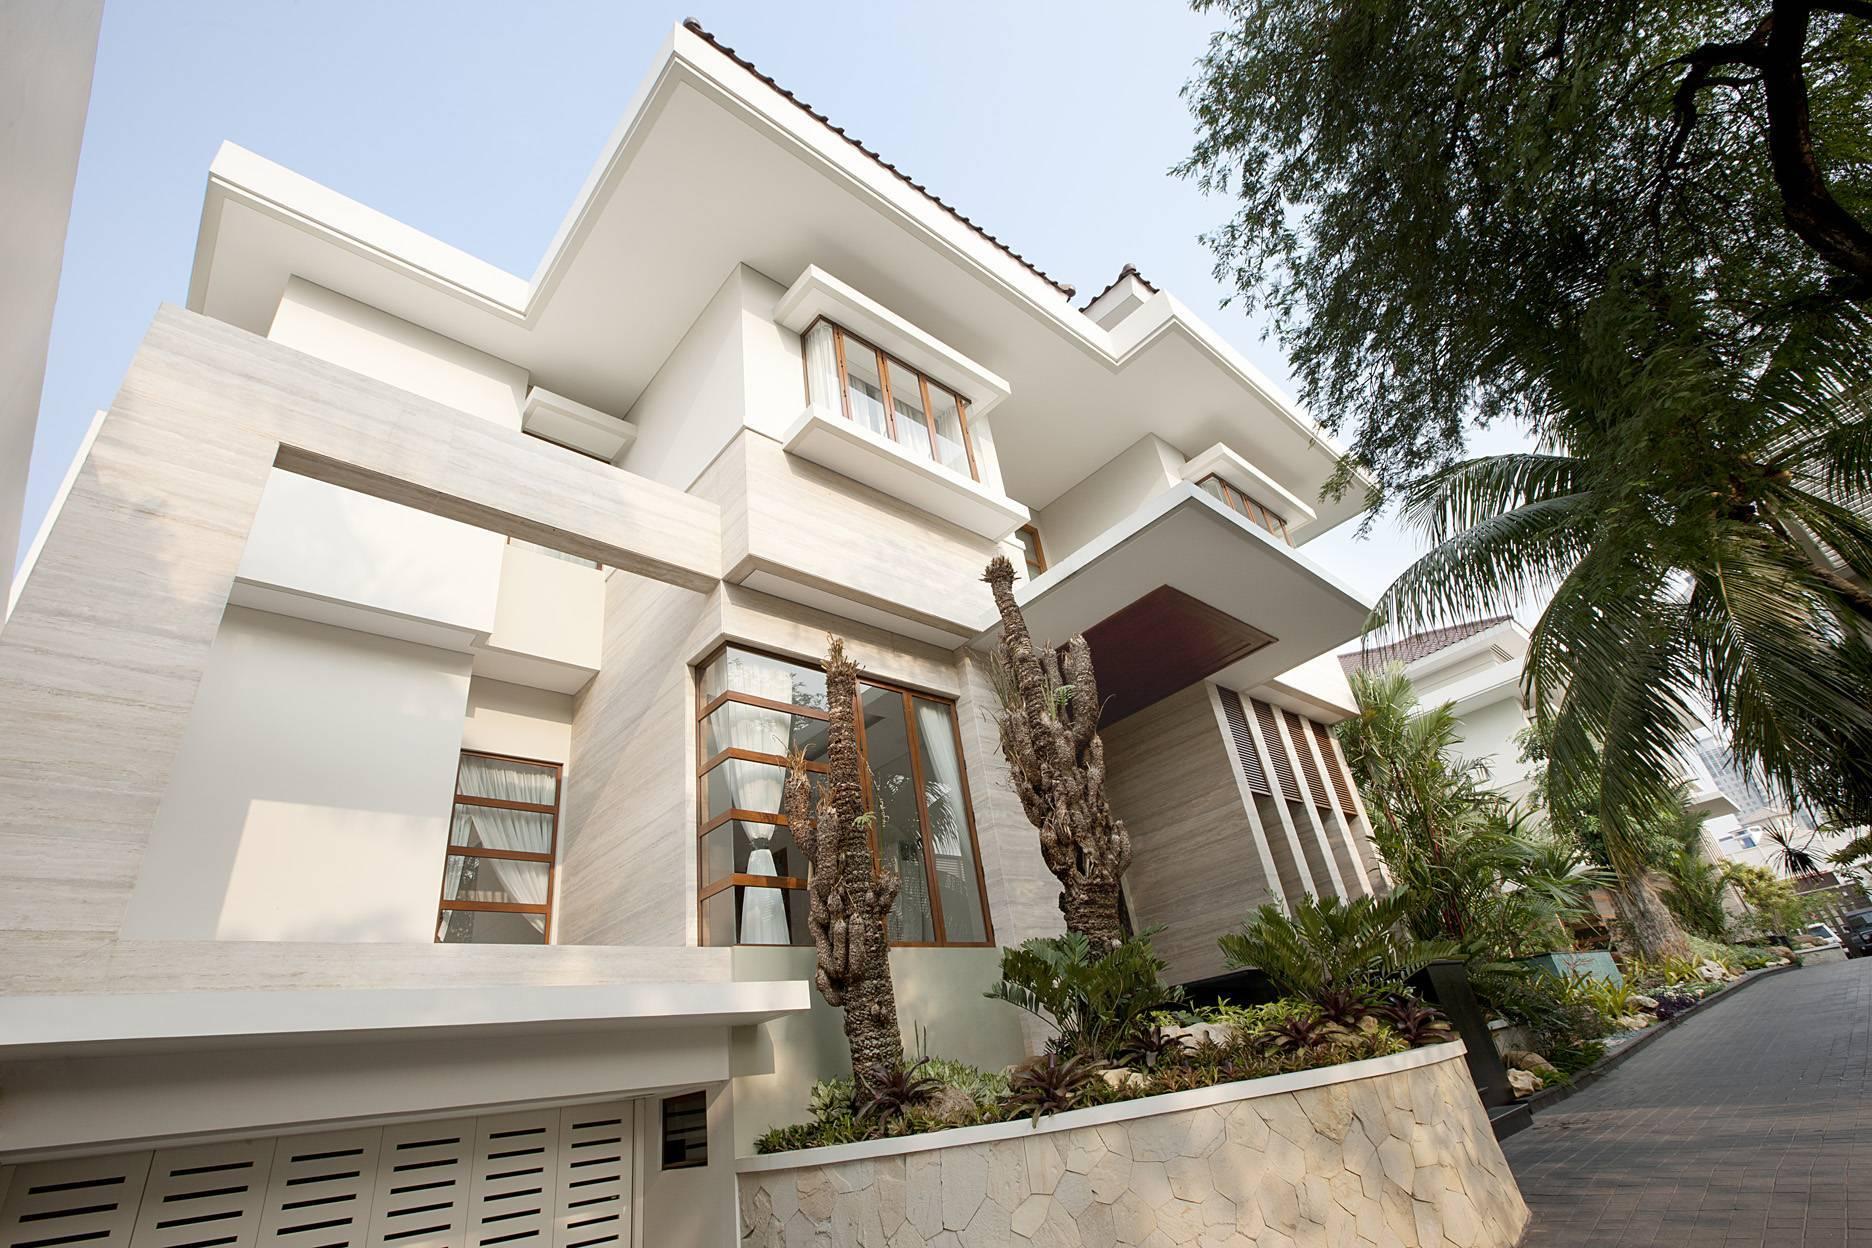 Parama Dharma Rumah Opal Indonesia Indonesia Facelift   350